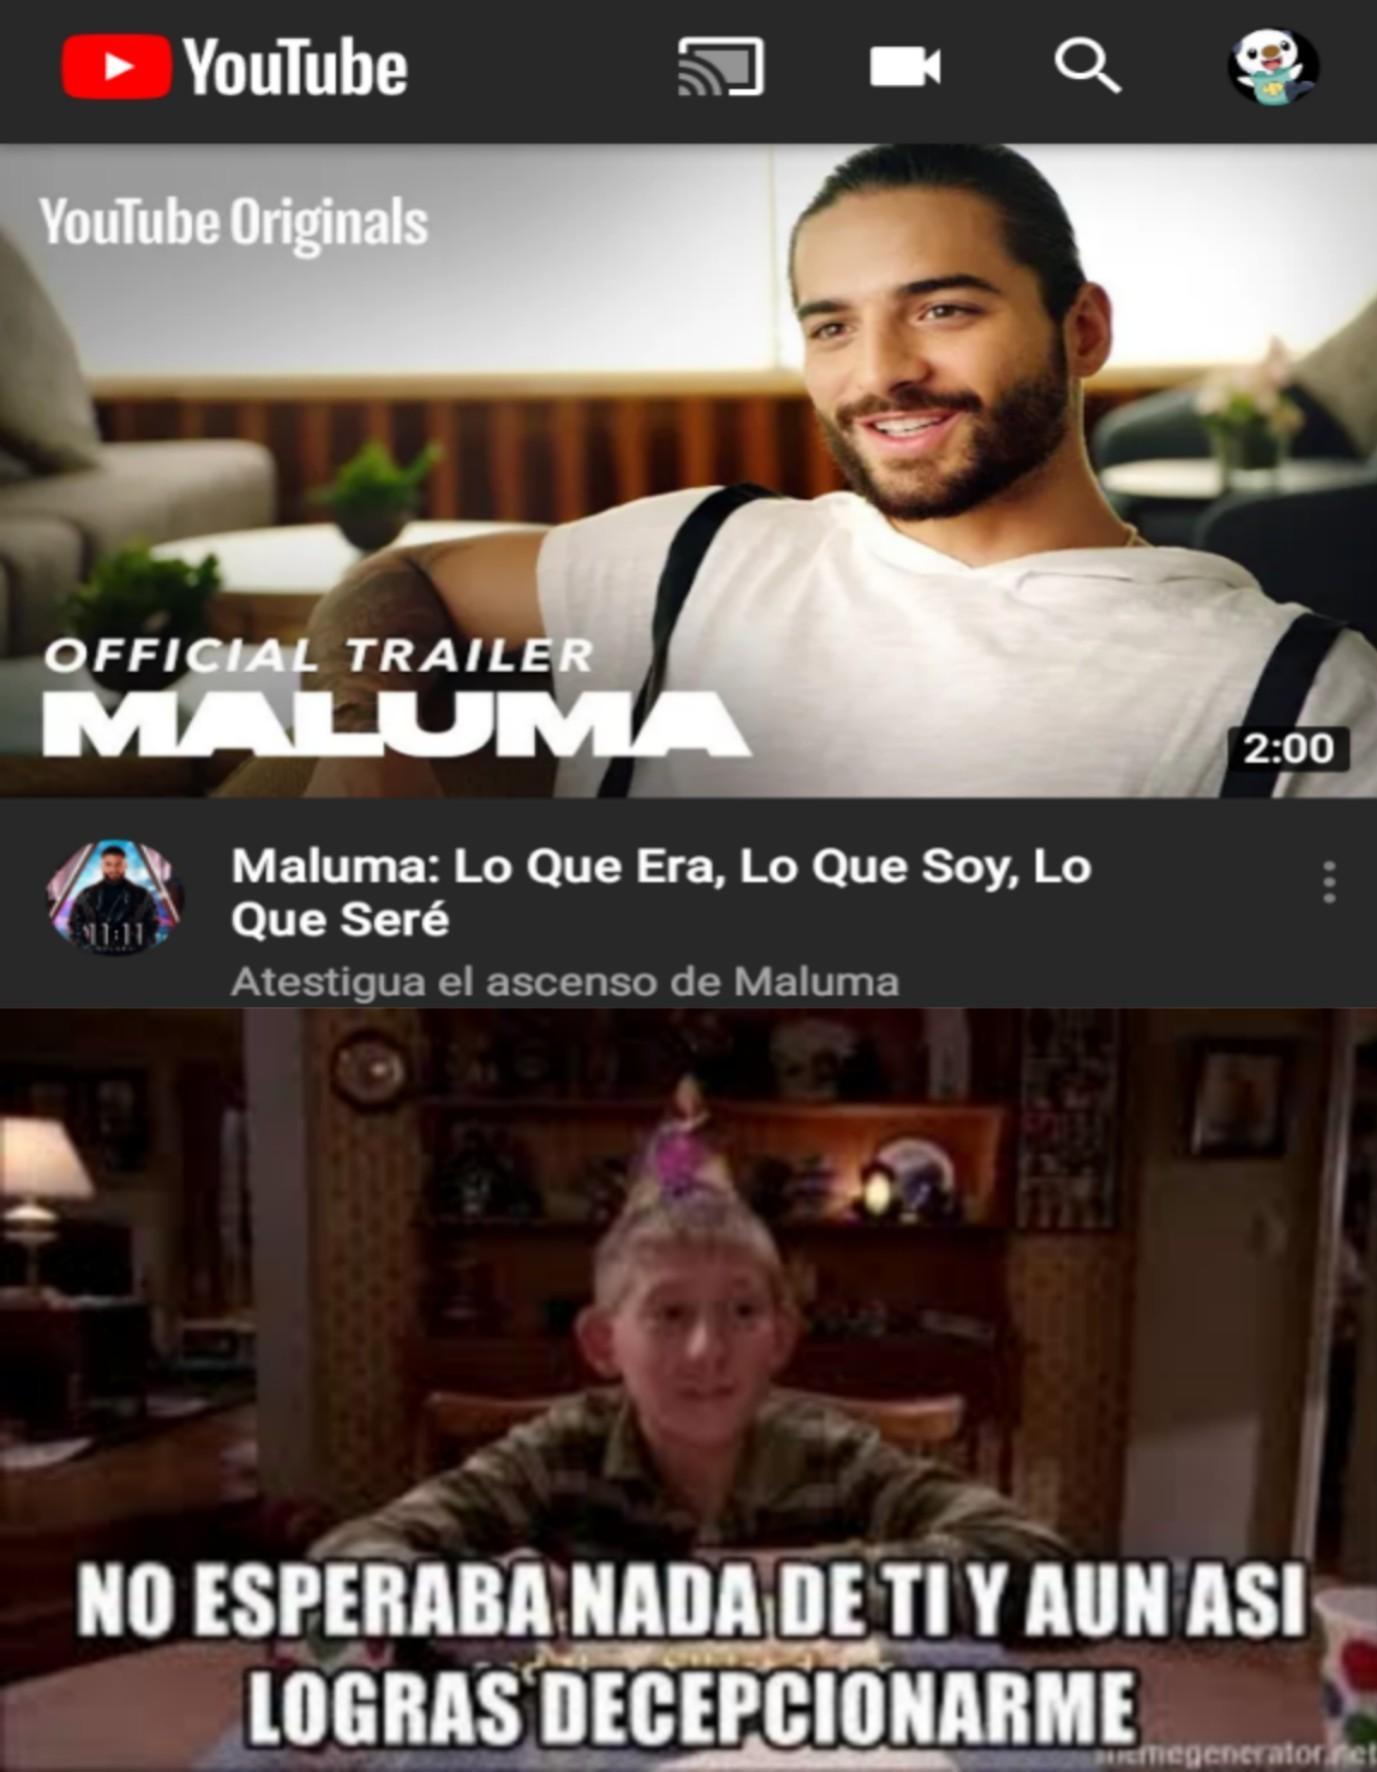 Ese youtube - meme